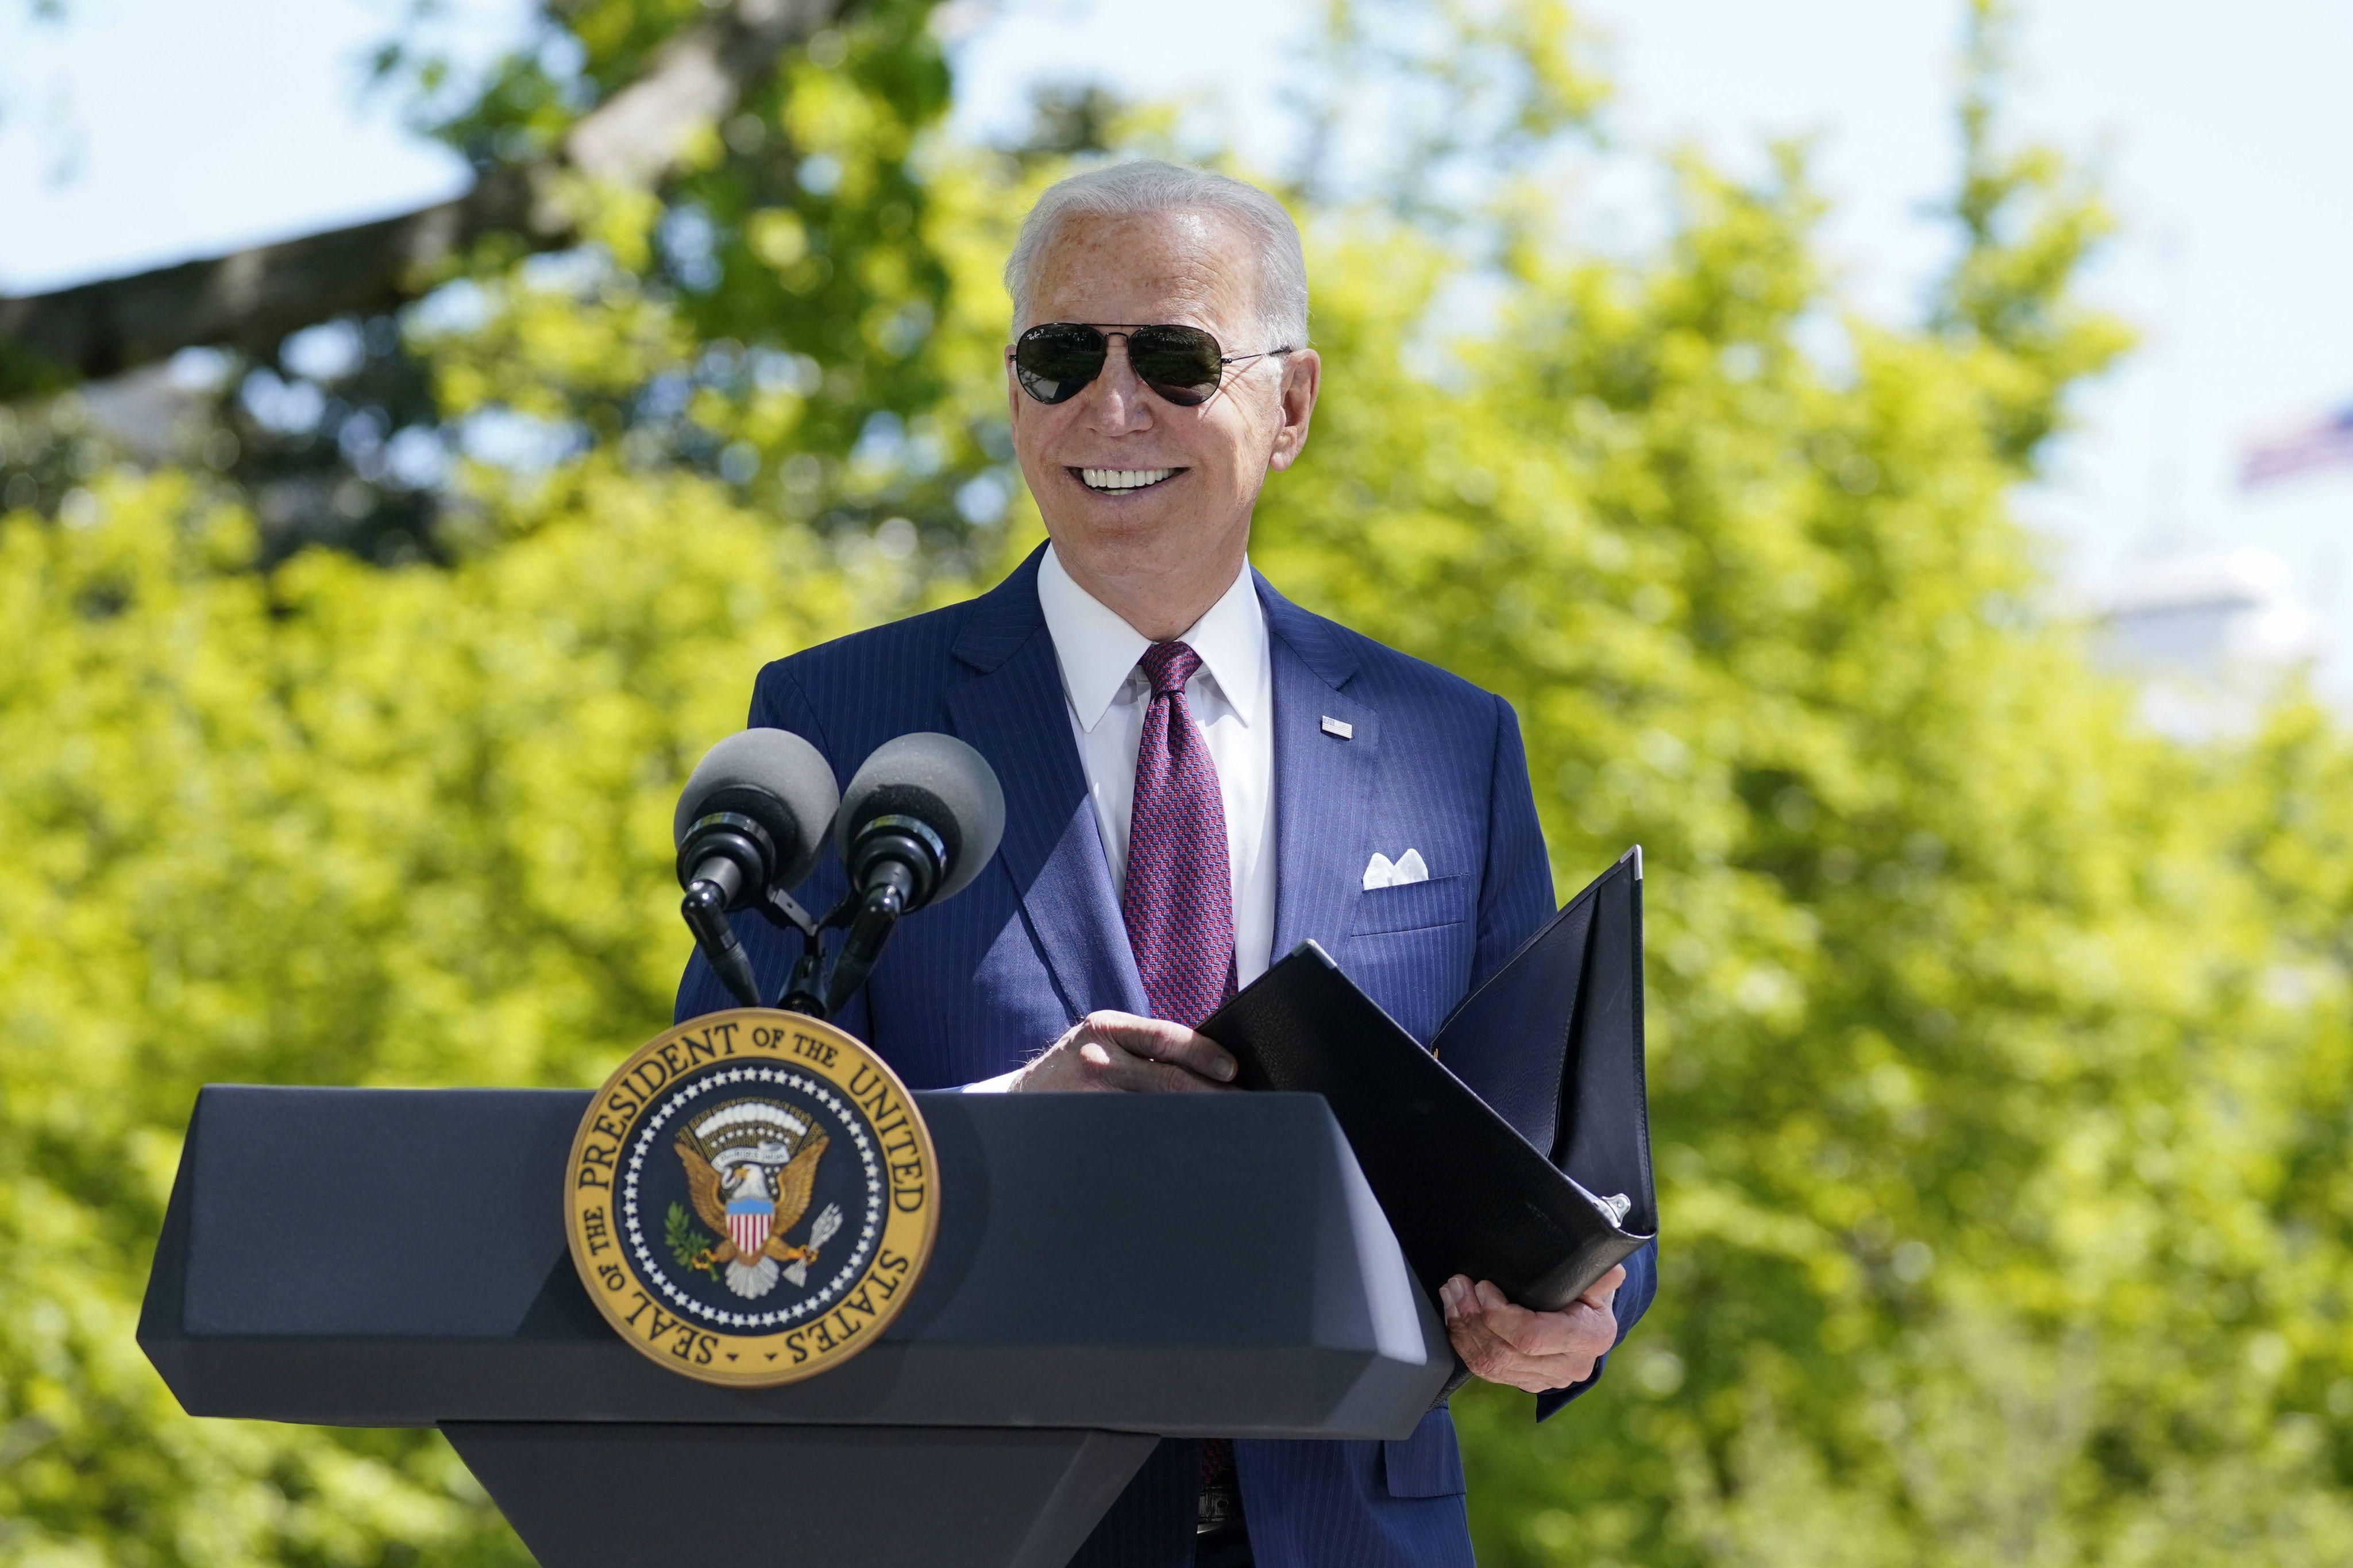 648x415 president americain joe biden fait point presse covid 19 27 avril 2021 jardins maison blanche